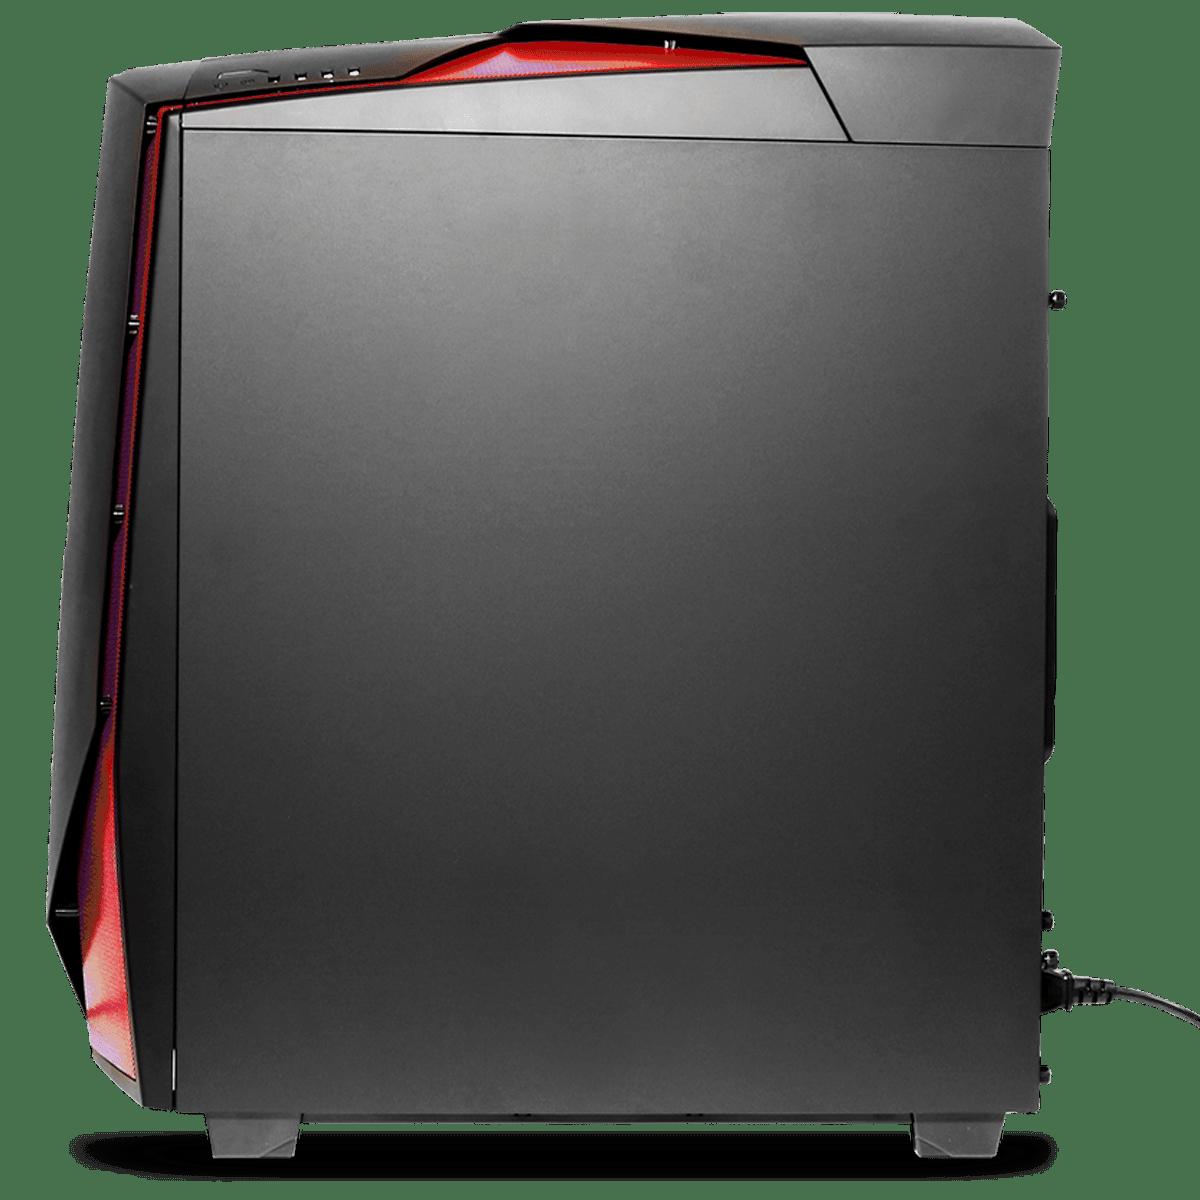 AMD Ryzen 3 Configurator: iBUYPOWER® Gaming PC